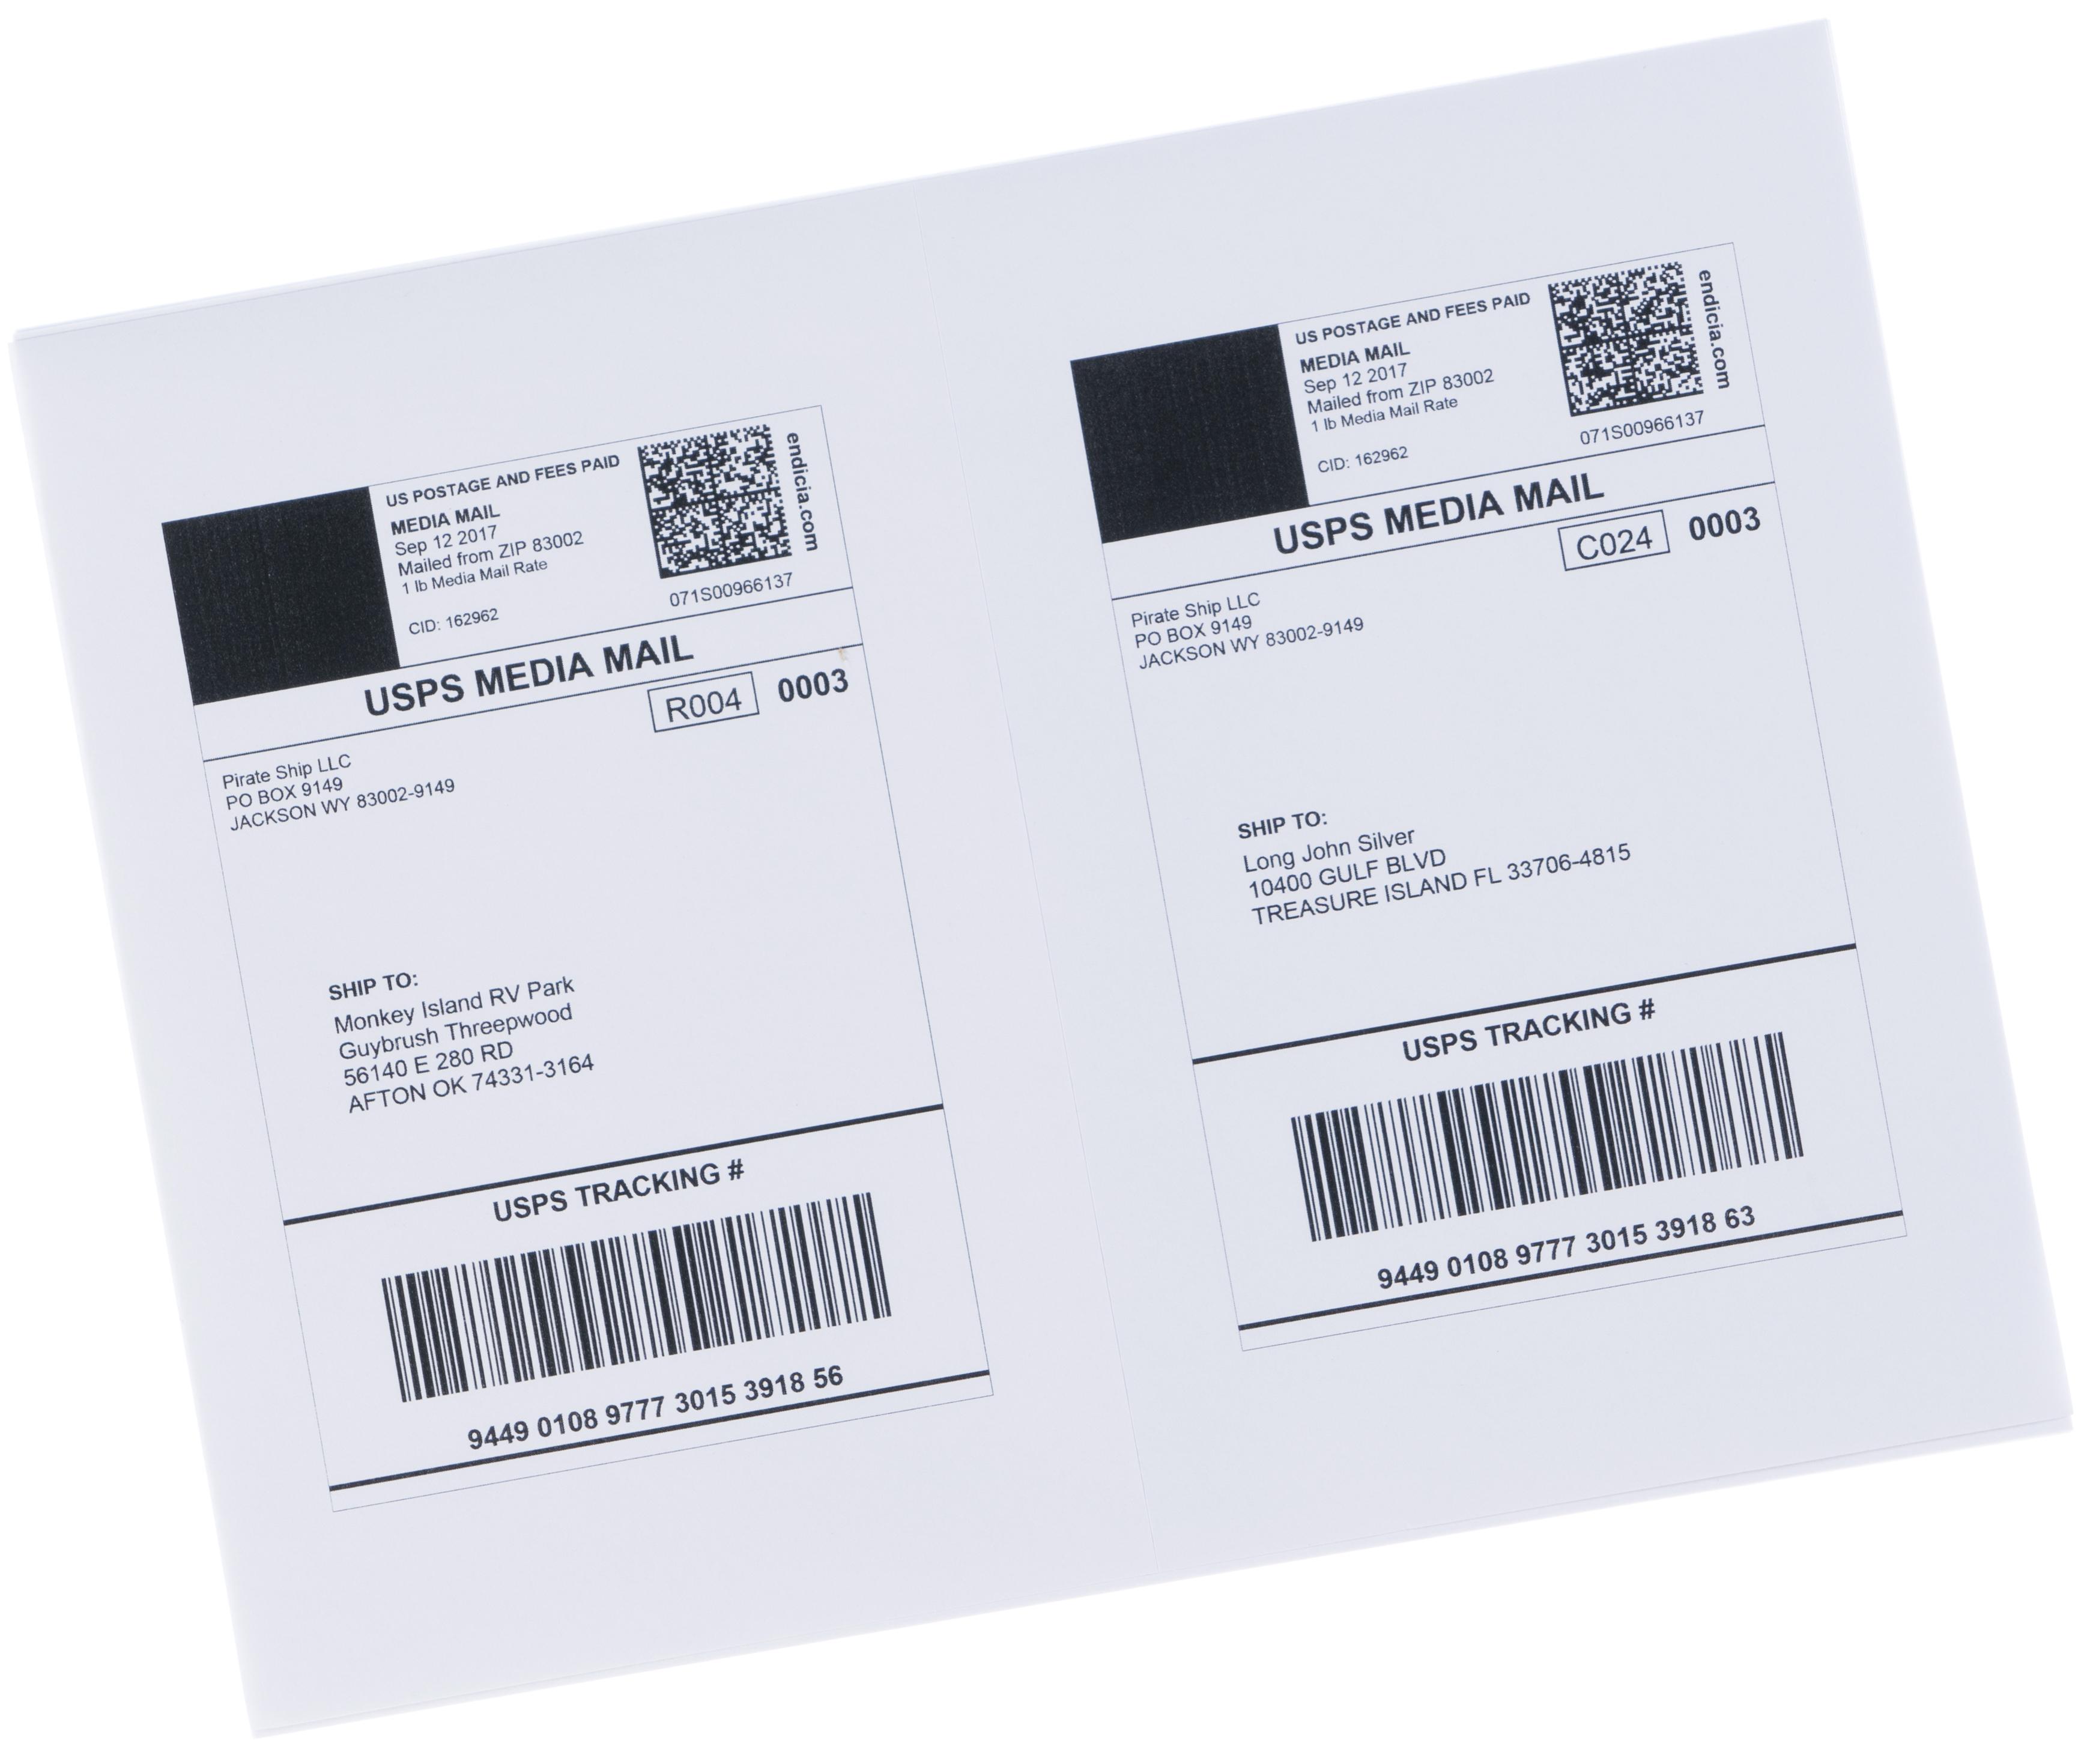 Media Mail postage labels